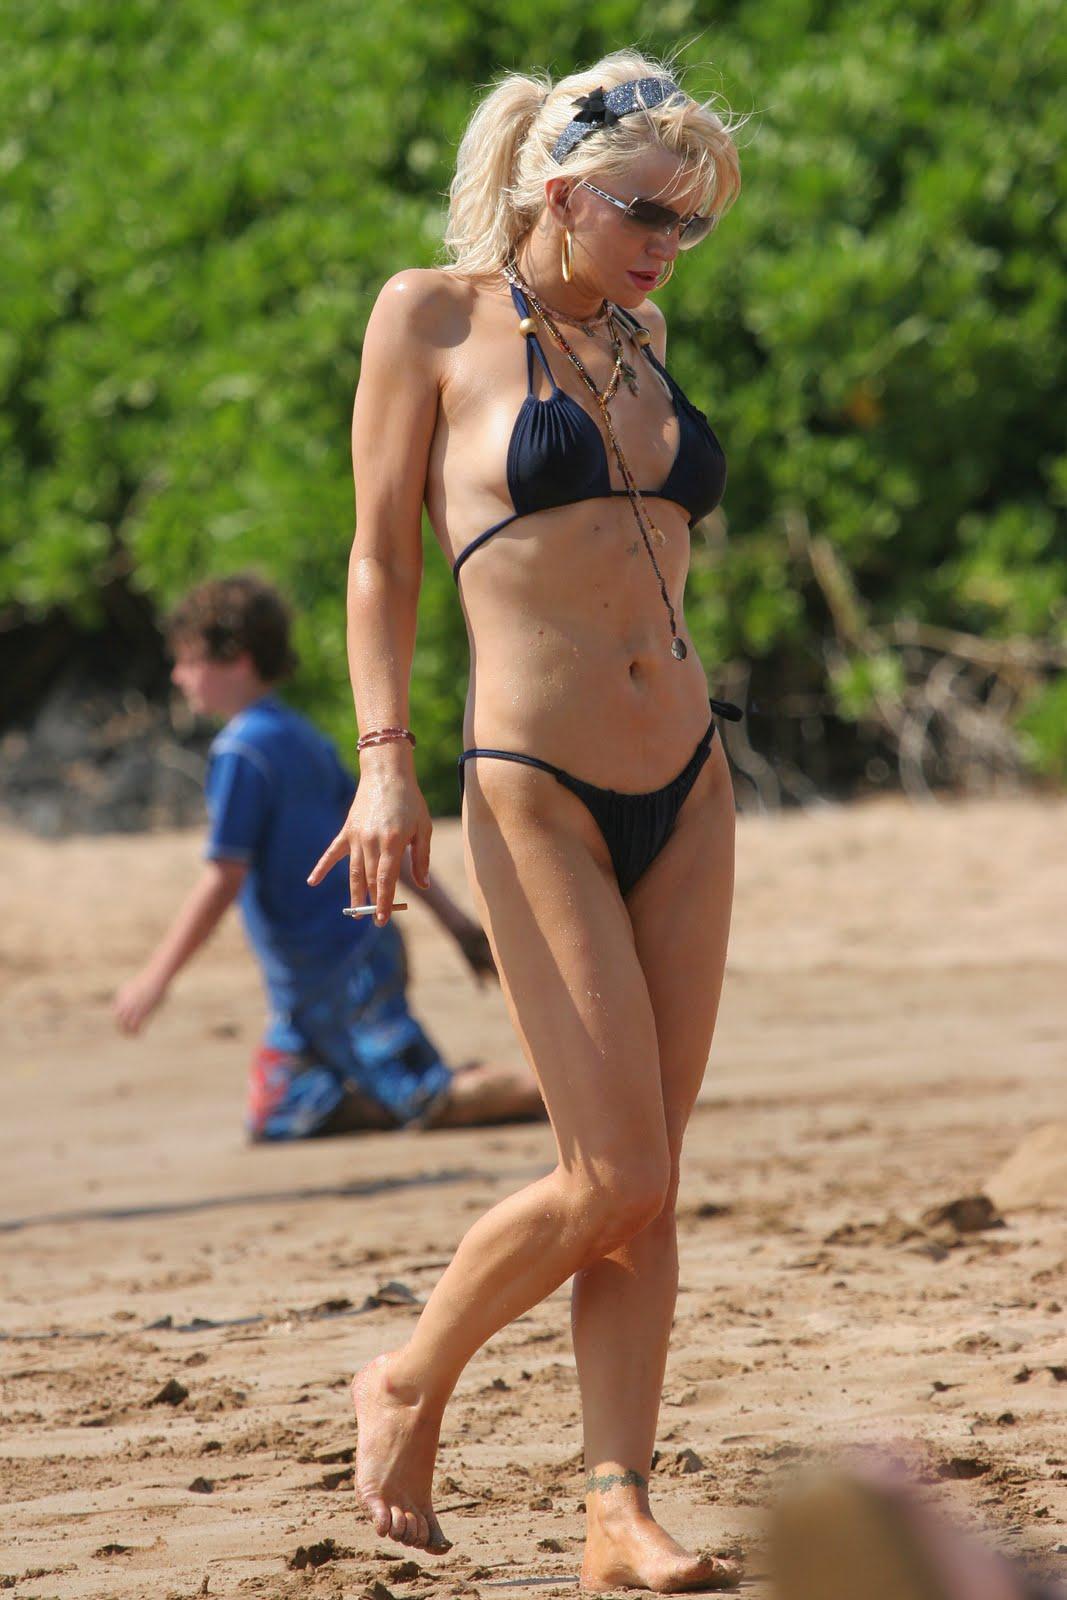 Feet Courtney Love nudes (97 pics), Twitter